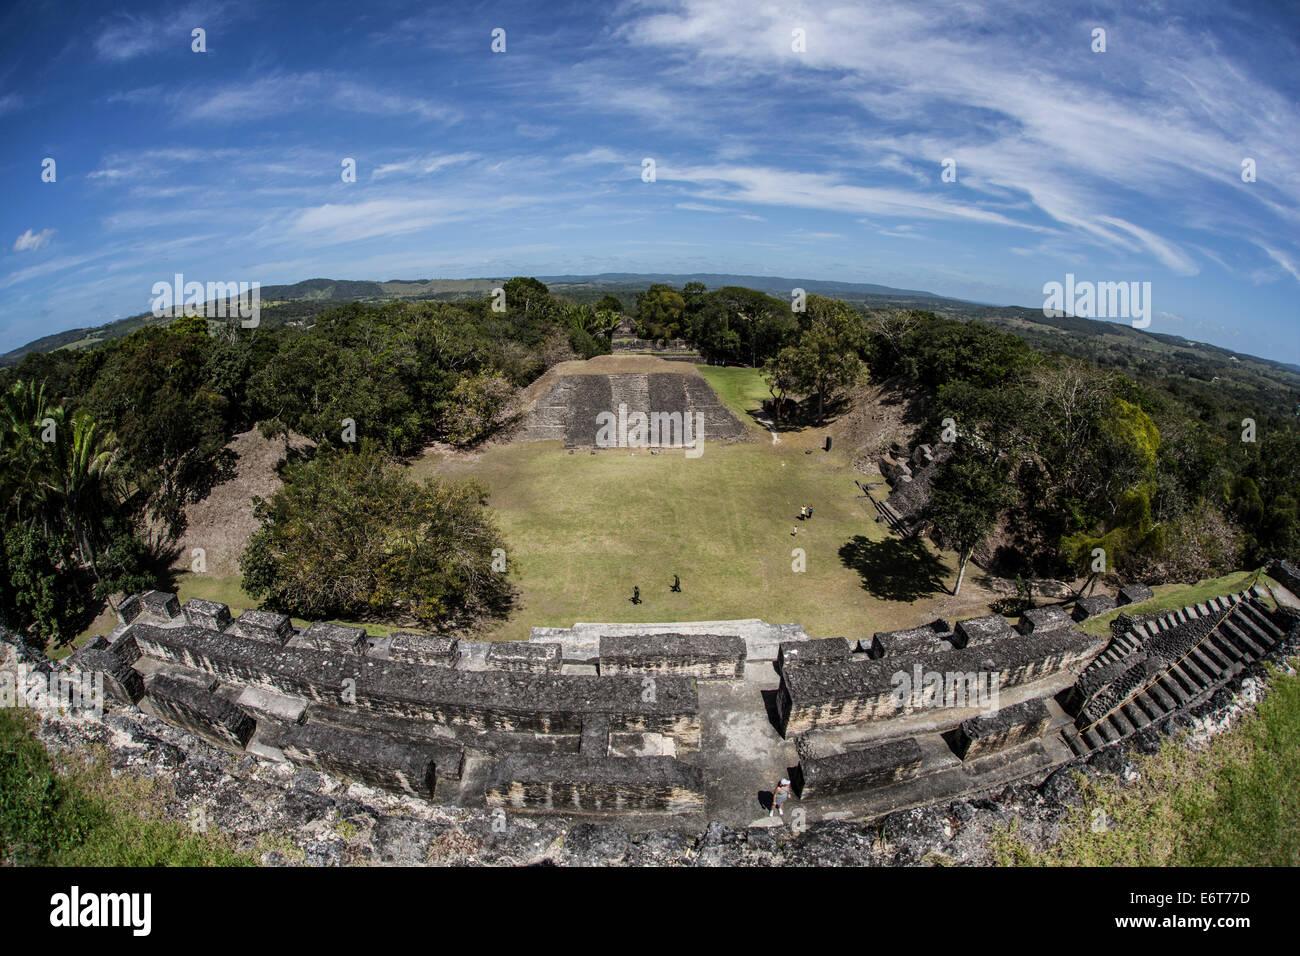 View of El Castillo Pyramid to Maya Ruins of Xunantunich, Caribbean, Belize - Stock Image